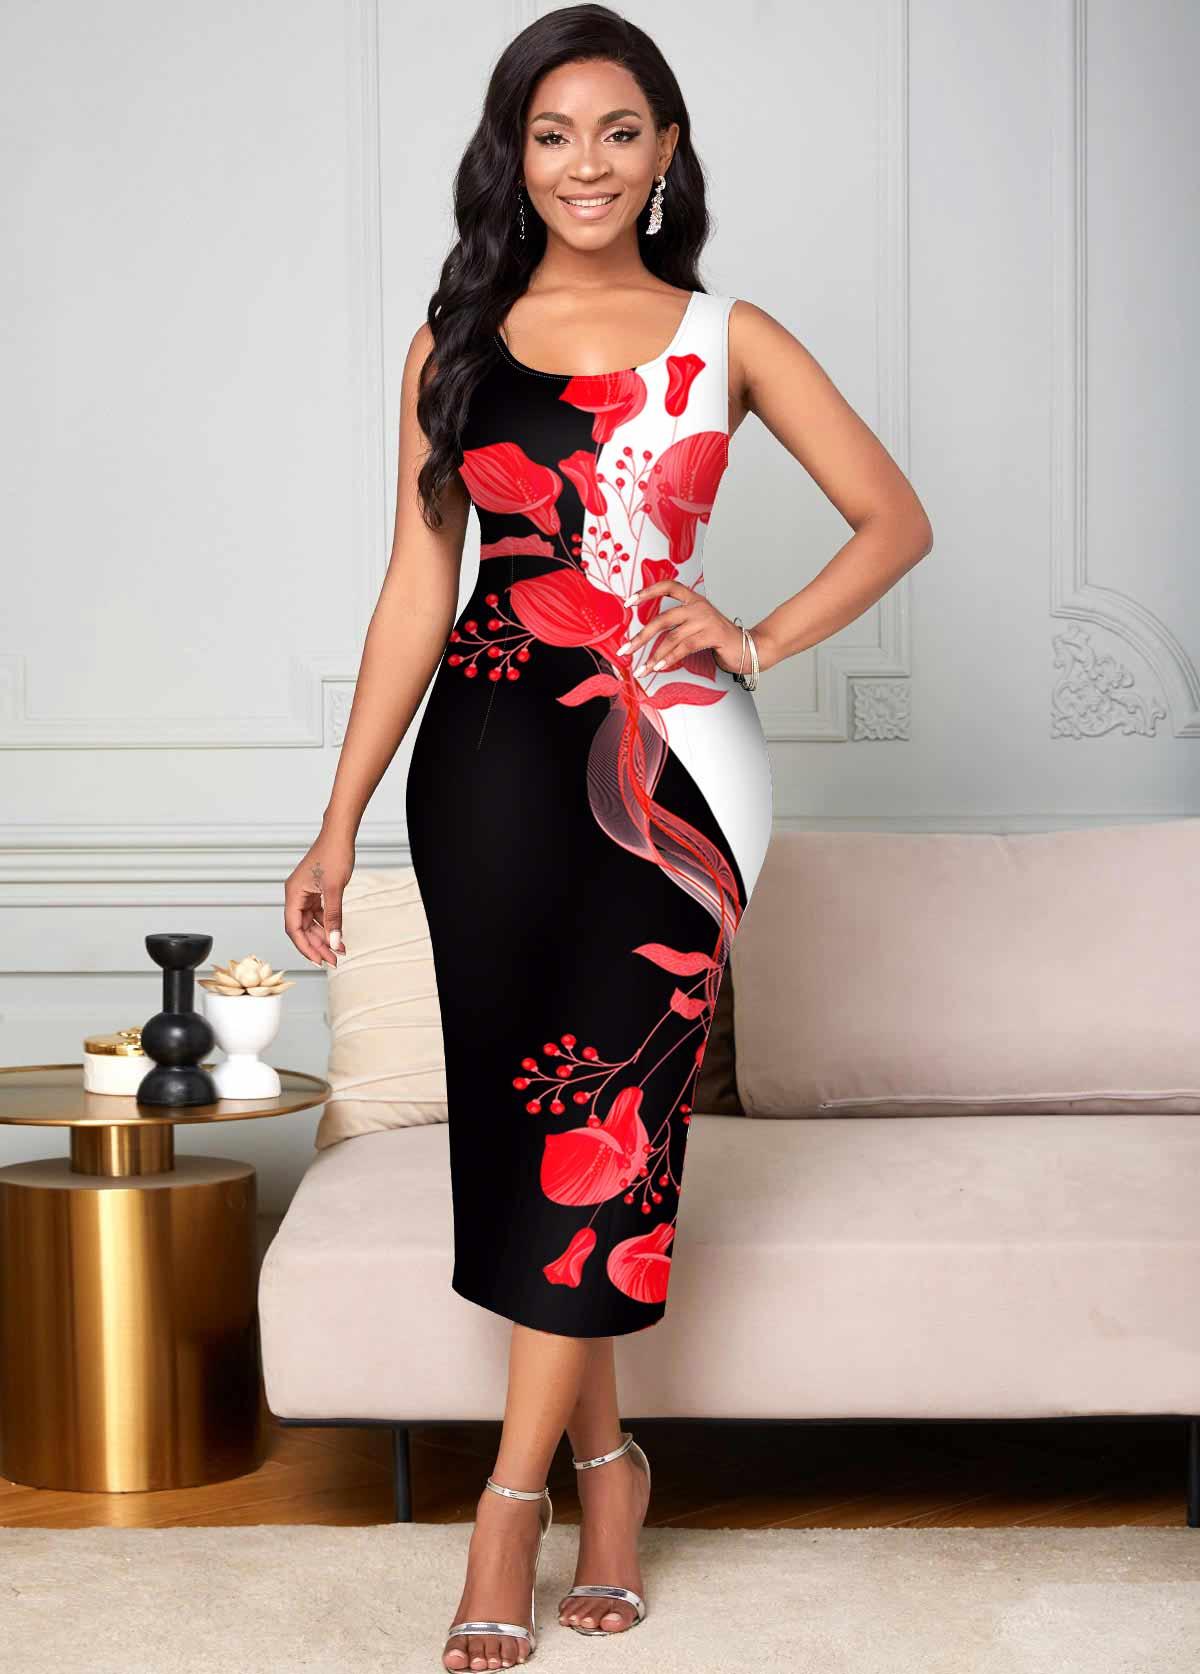 Floral Print Contrast Sleeveless Bodycon Dress